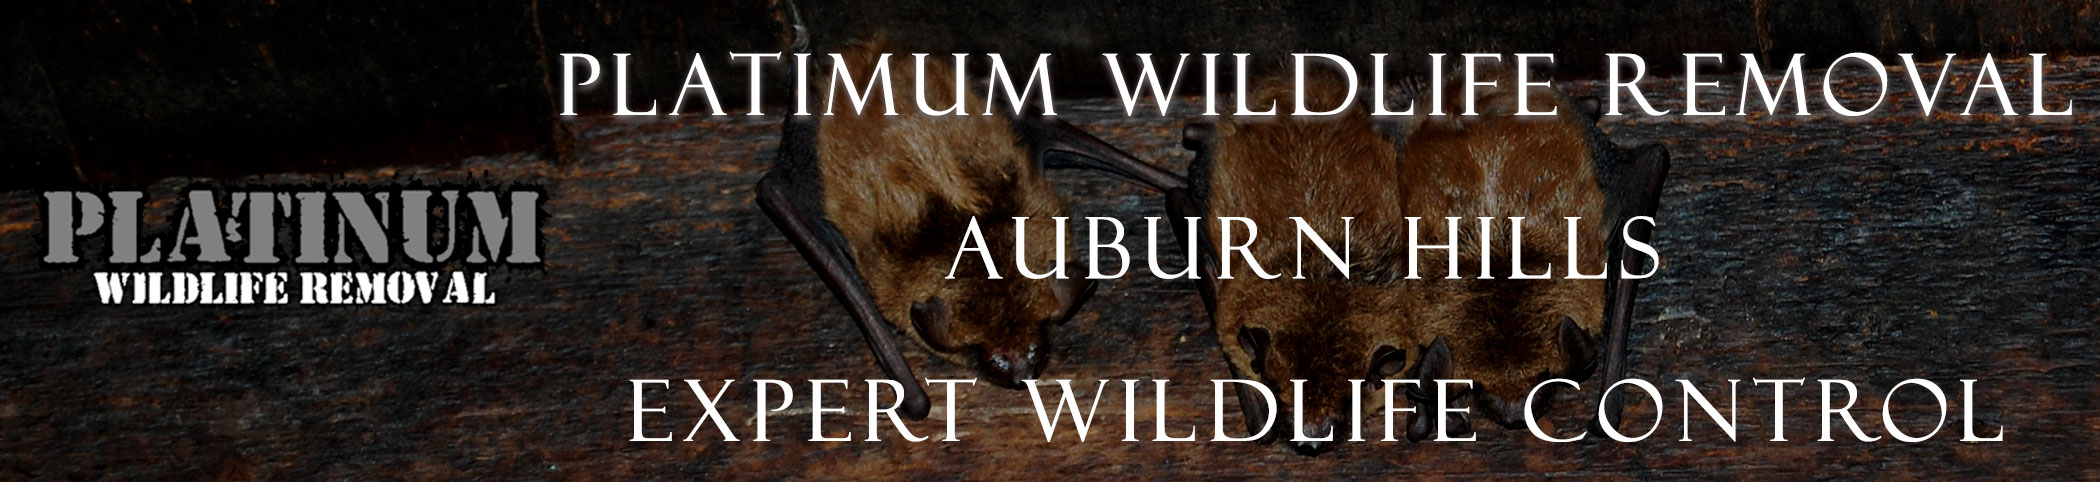 auburn_hills_michigan header image at bat removal pro